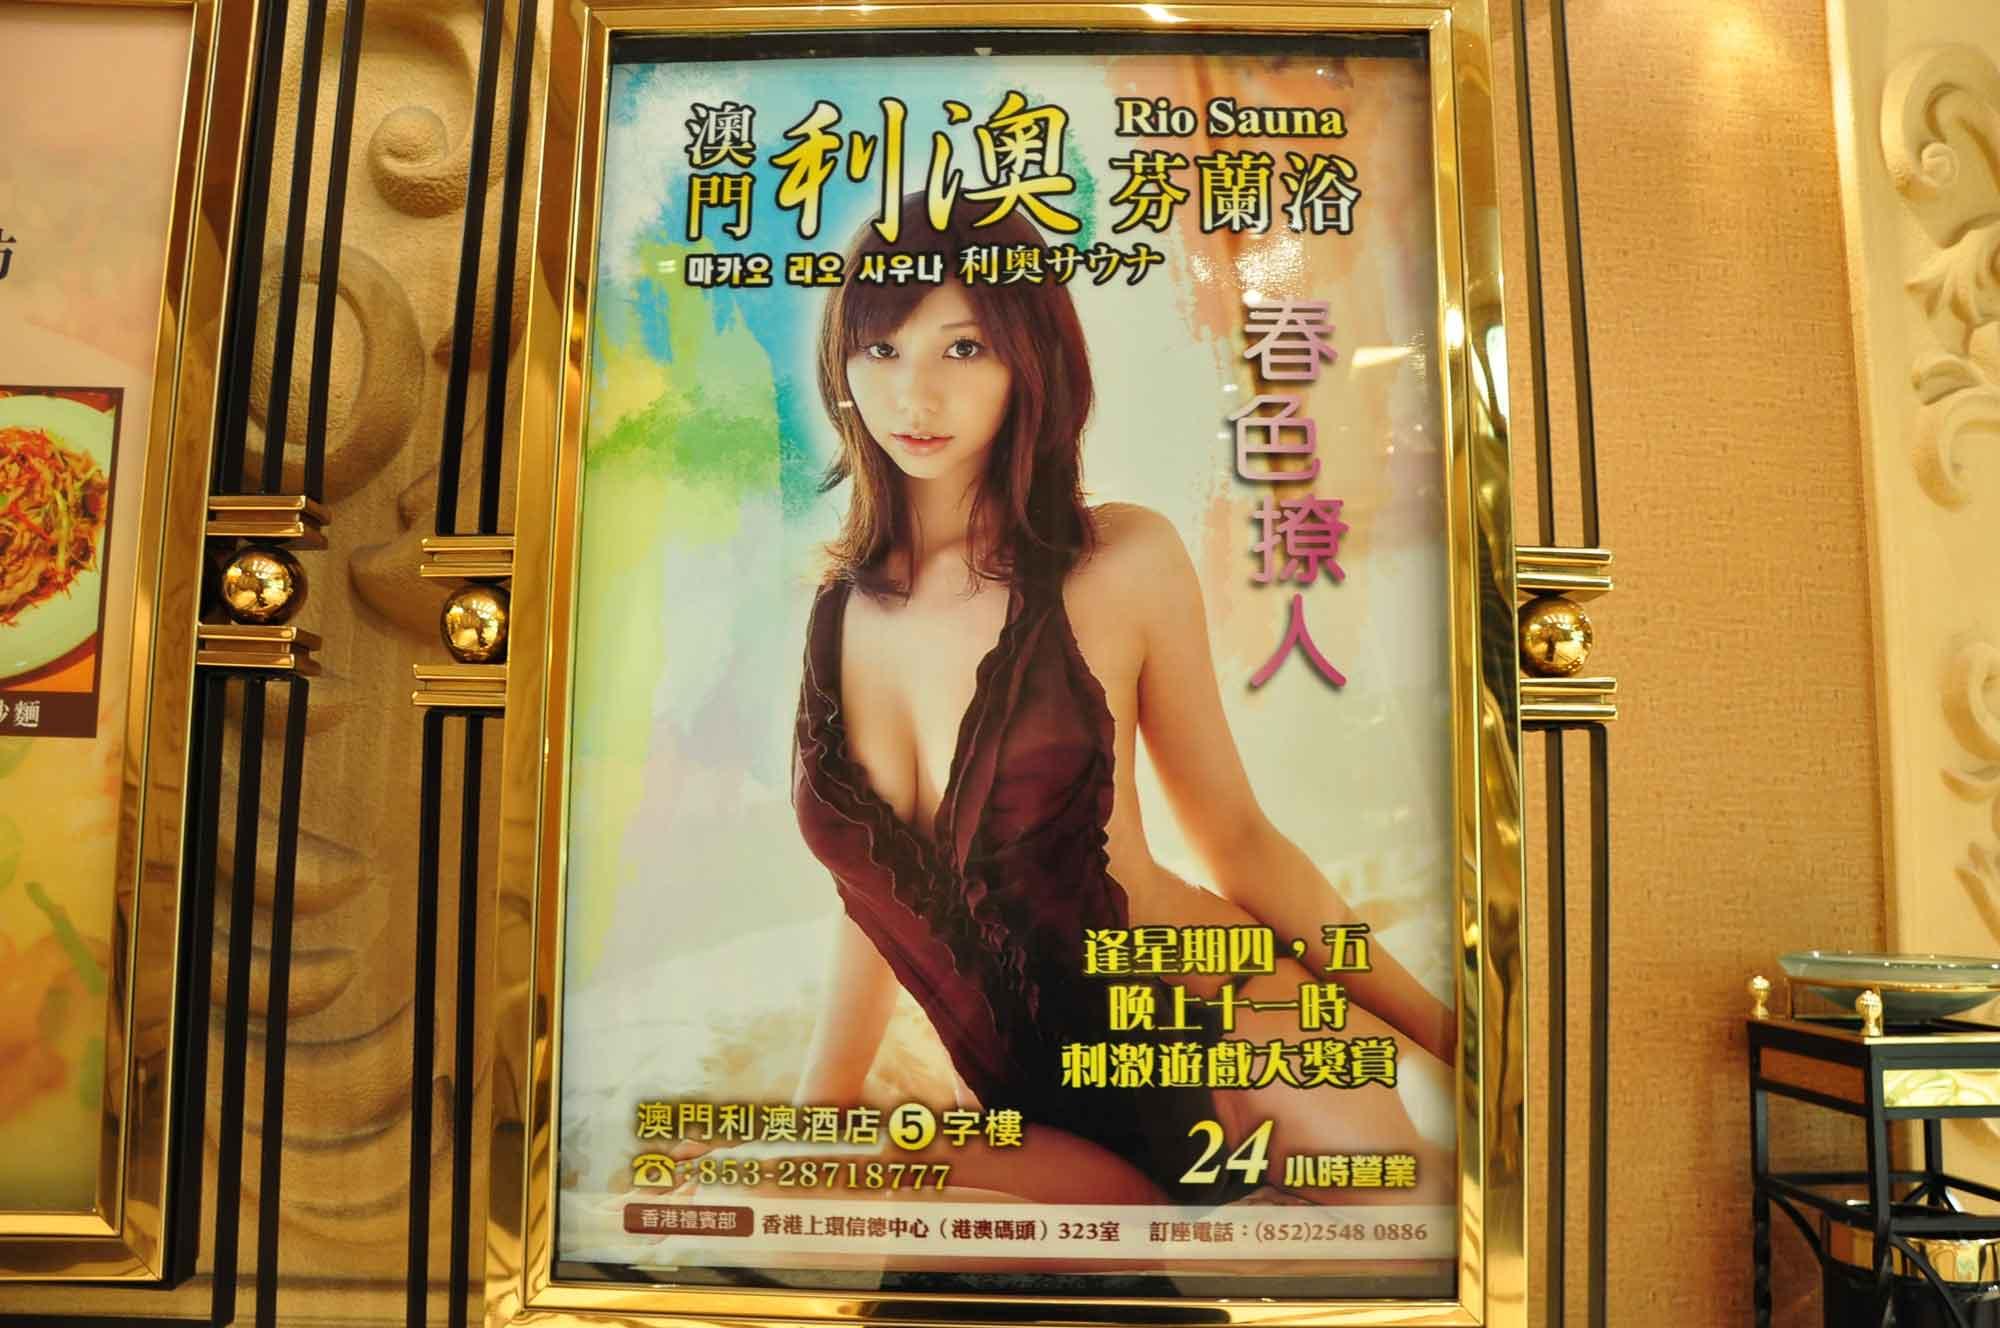 Rio Macau spa poster